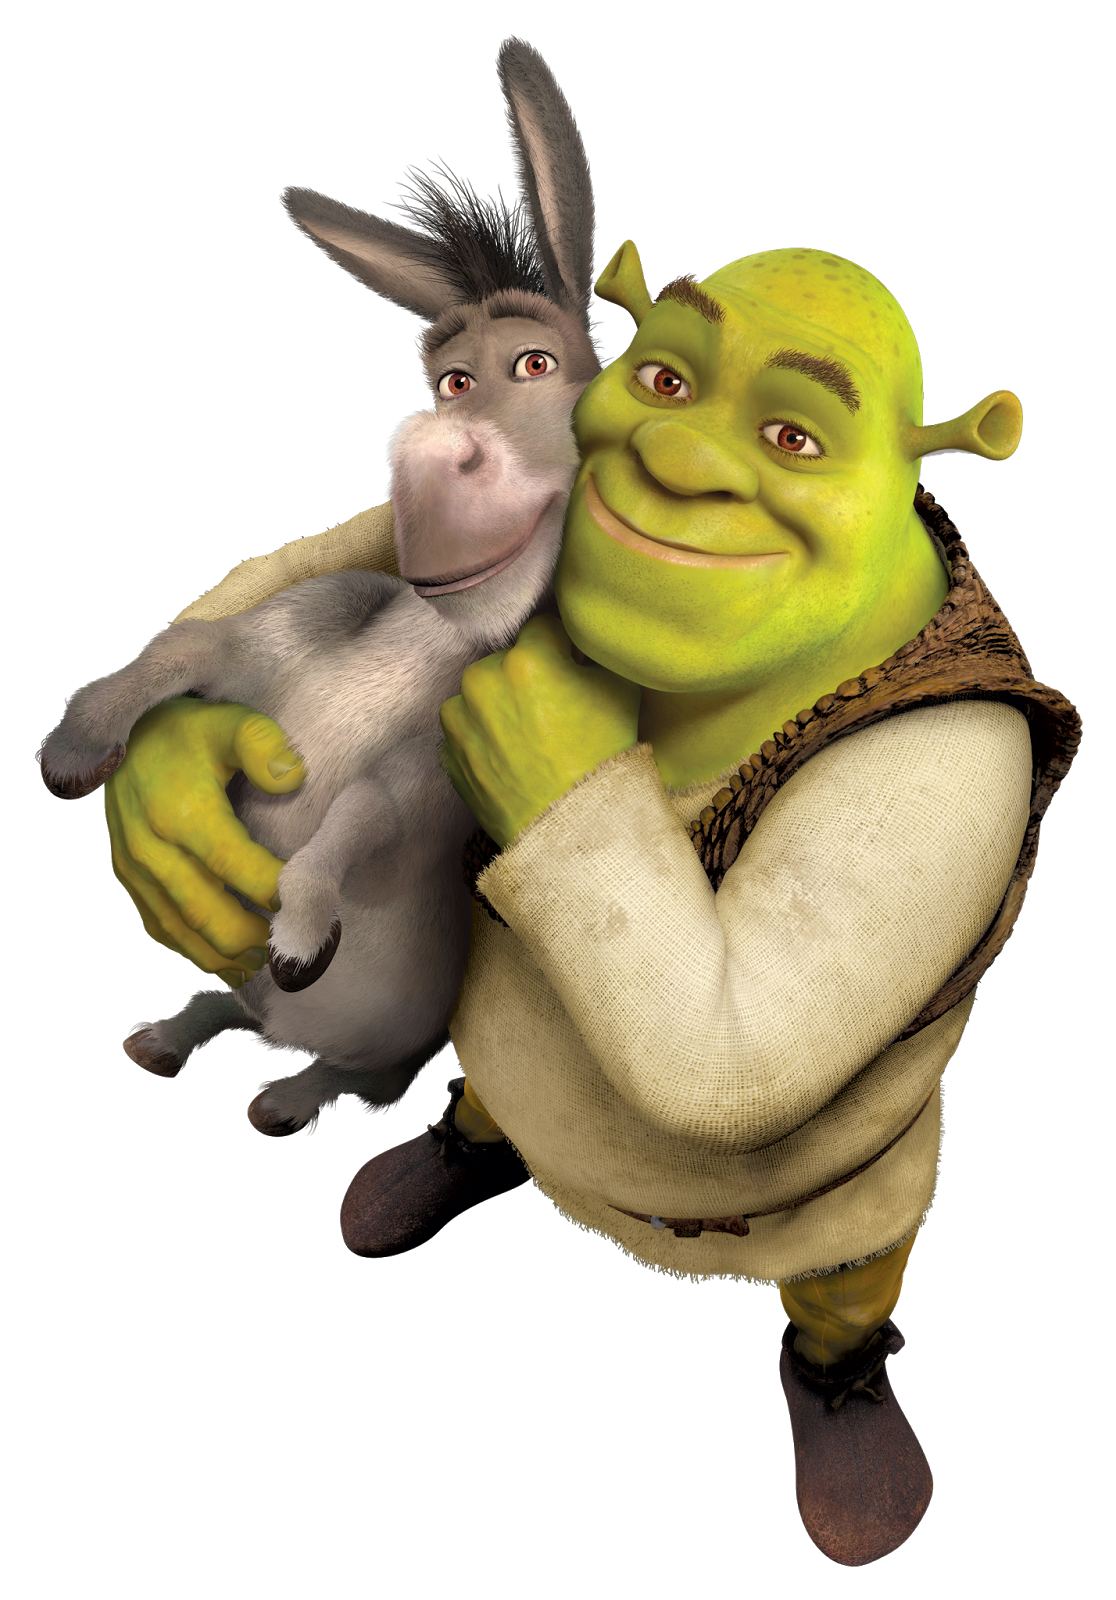 Png . Donkey clipart shrek character